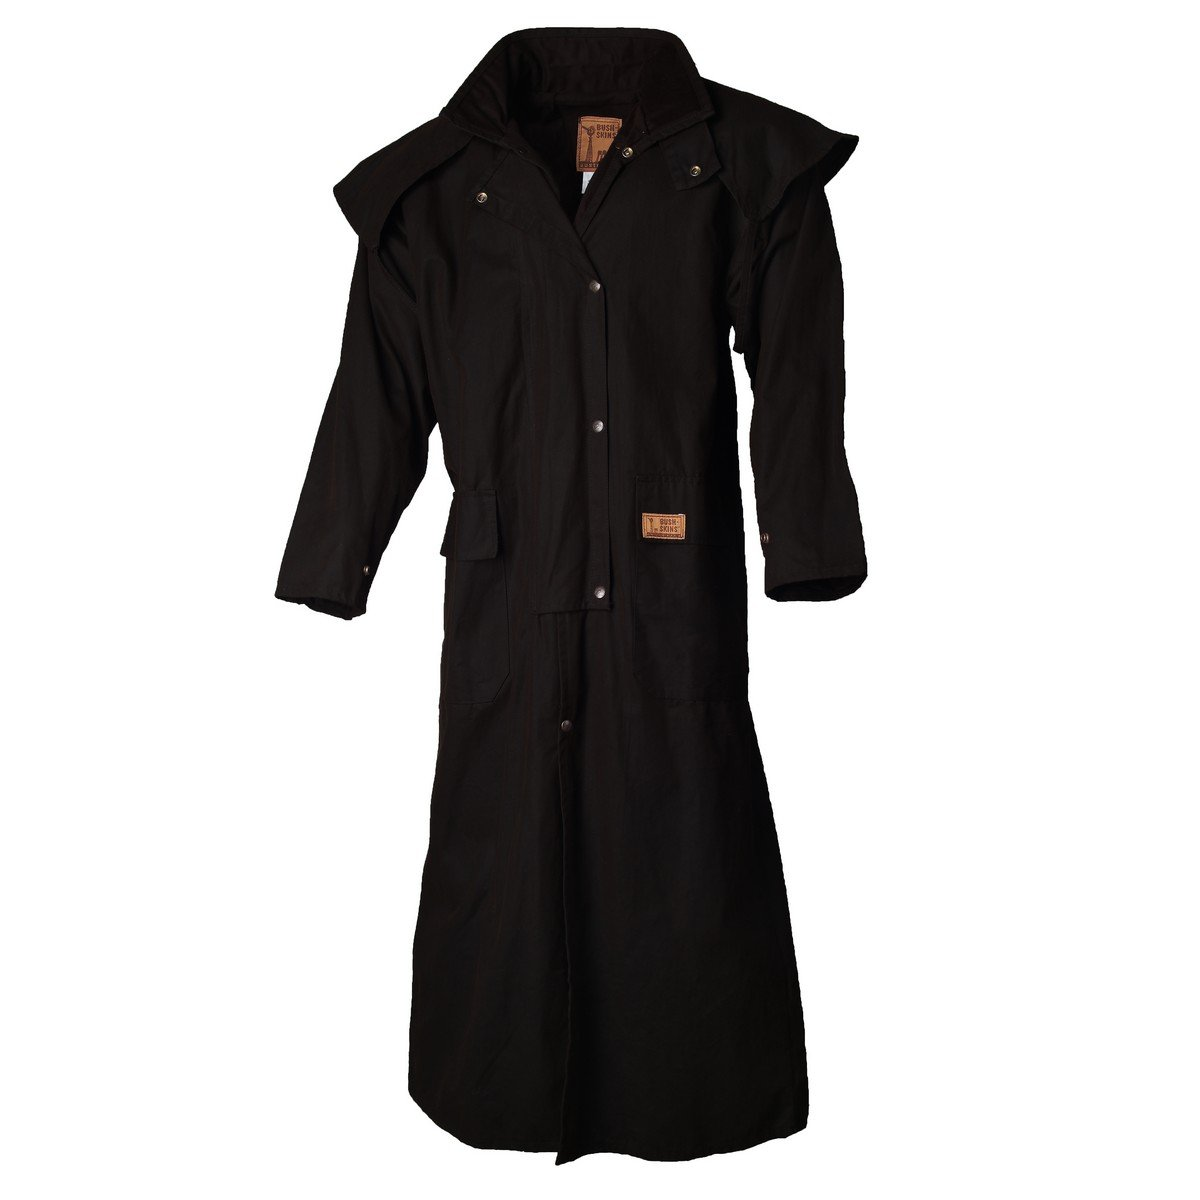 Afbeelding van Bush Skin Riding Coat Zwart 3xlarge